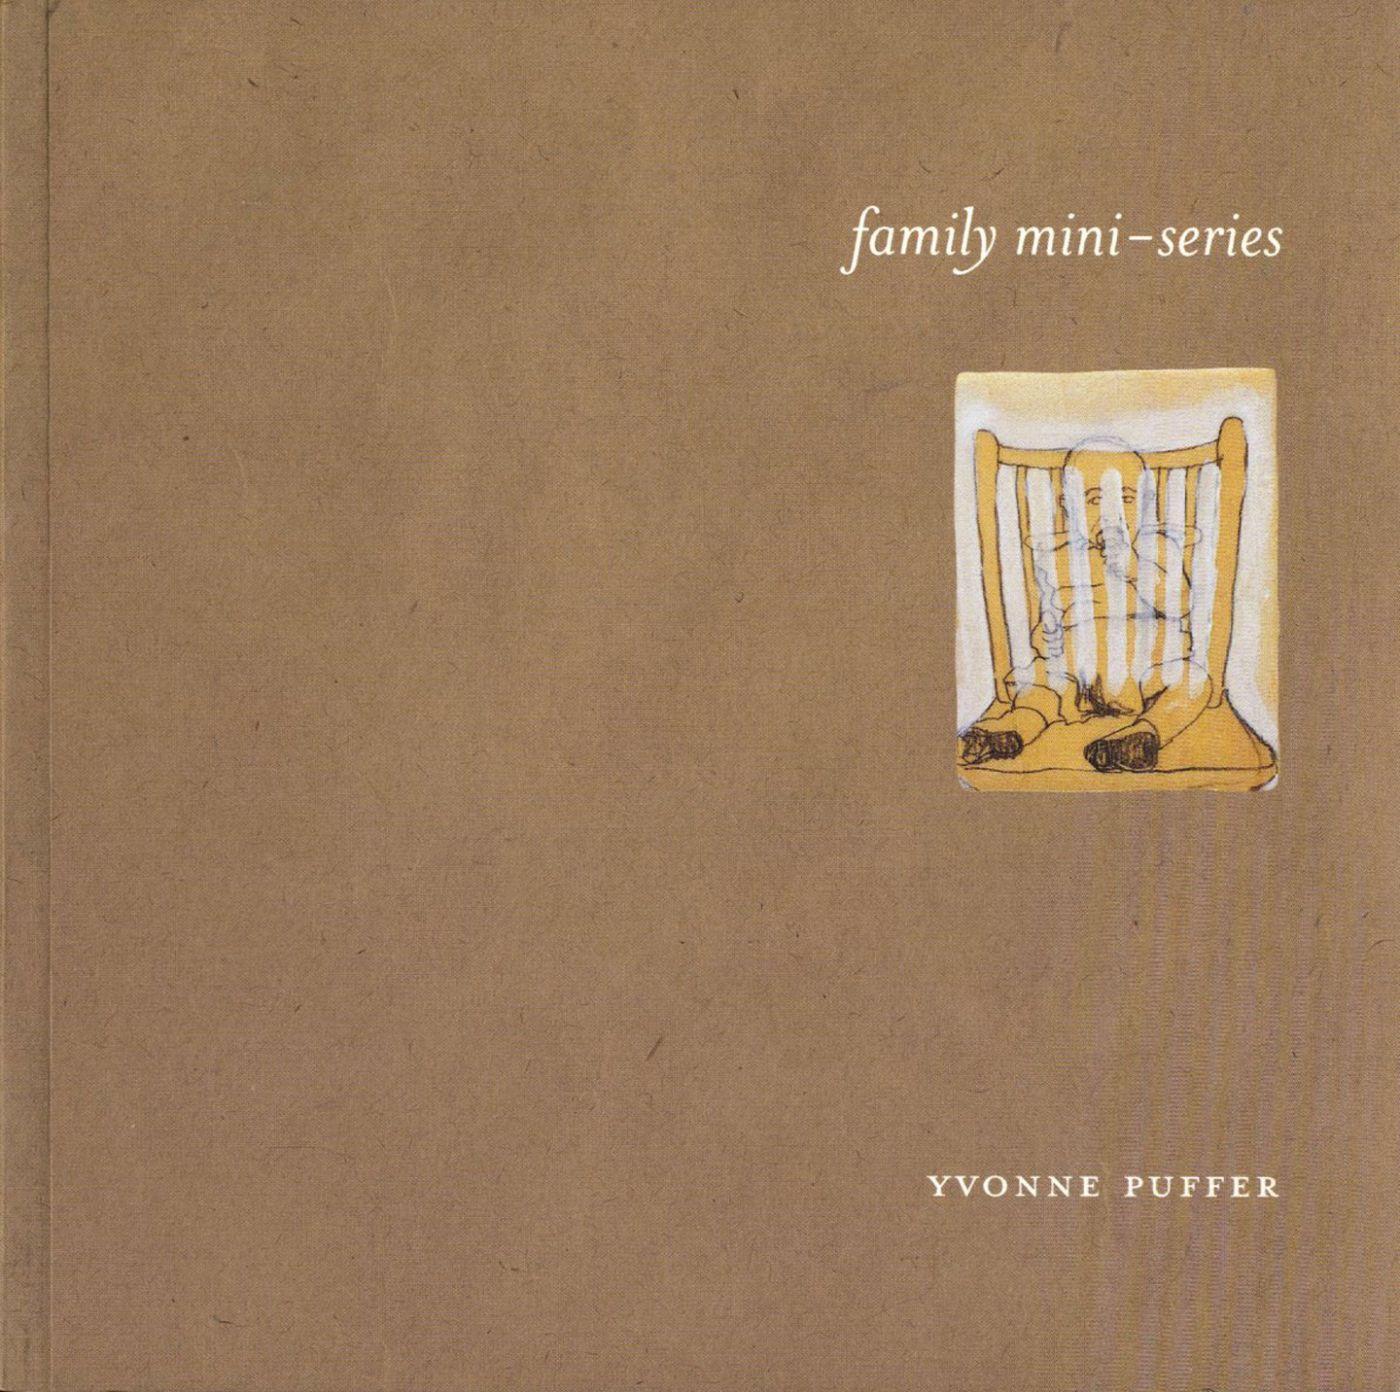 YVONNE PUFFER FAMILY MINI-SERIES /ANGLAIS